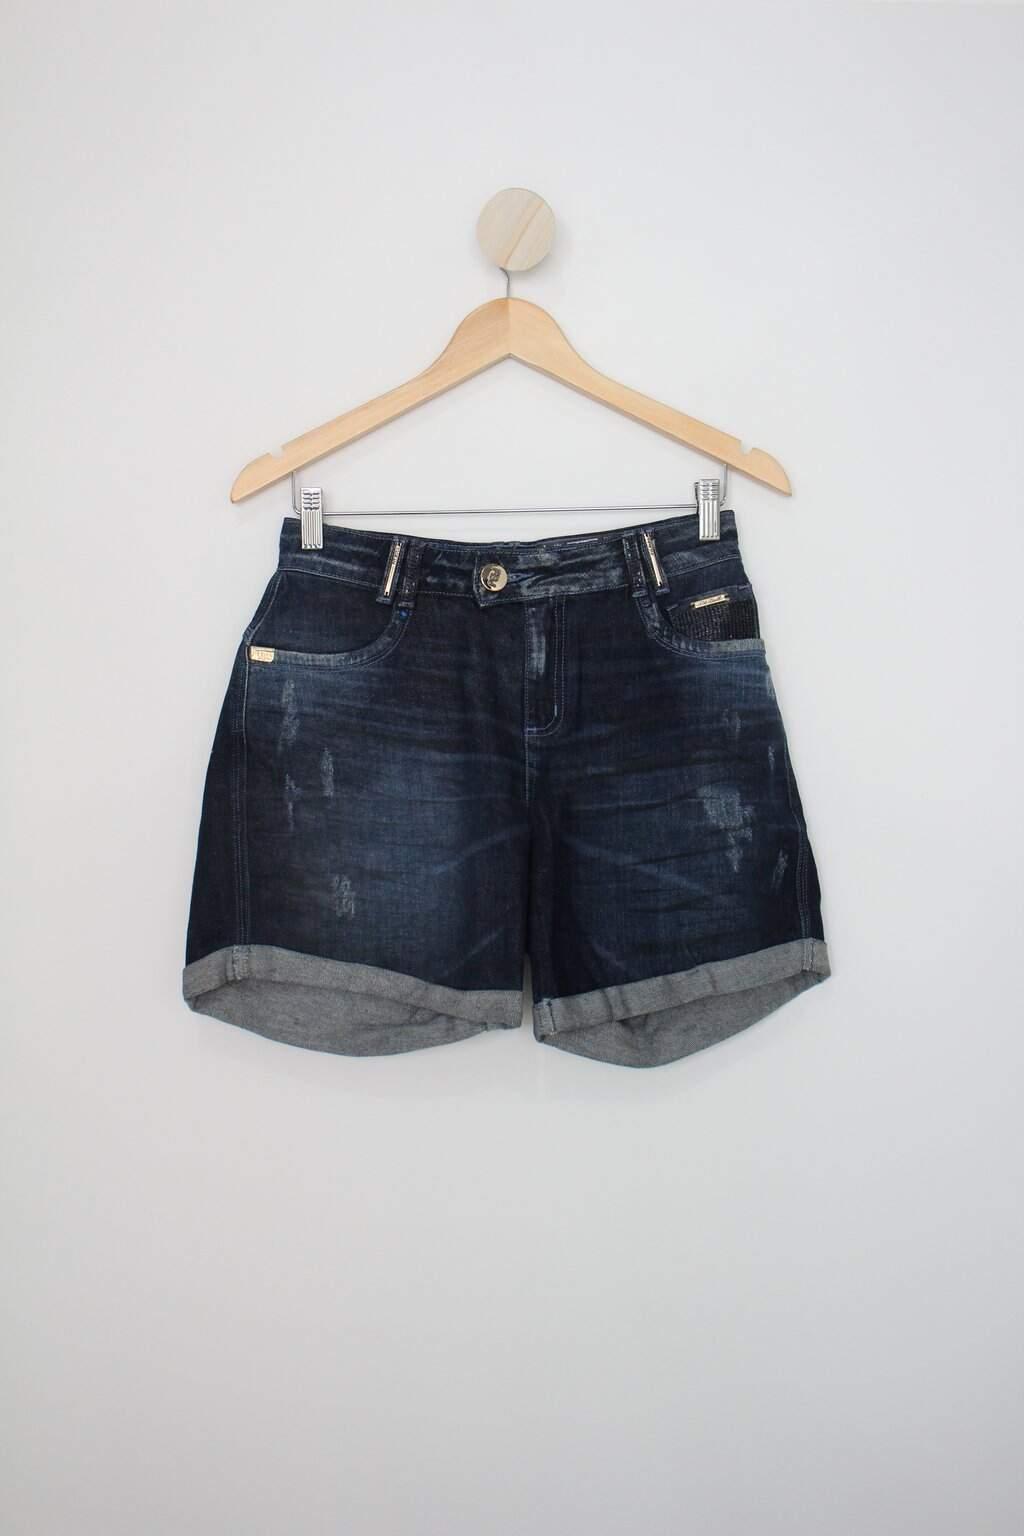 Shorts Pit Bull Jeans Feminino Azul